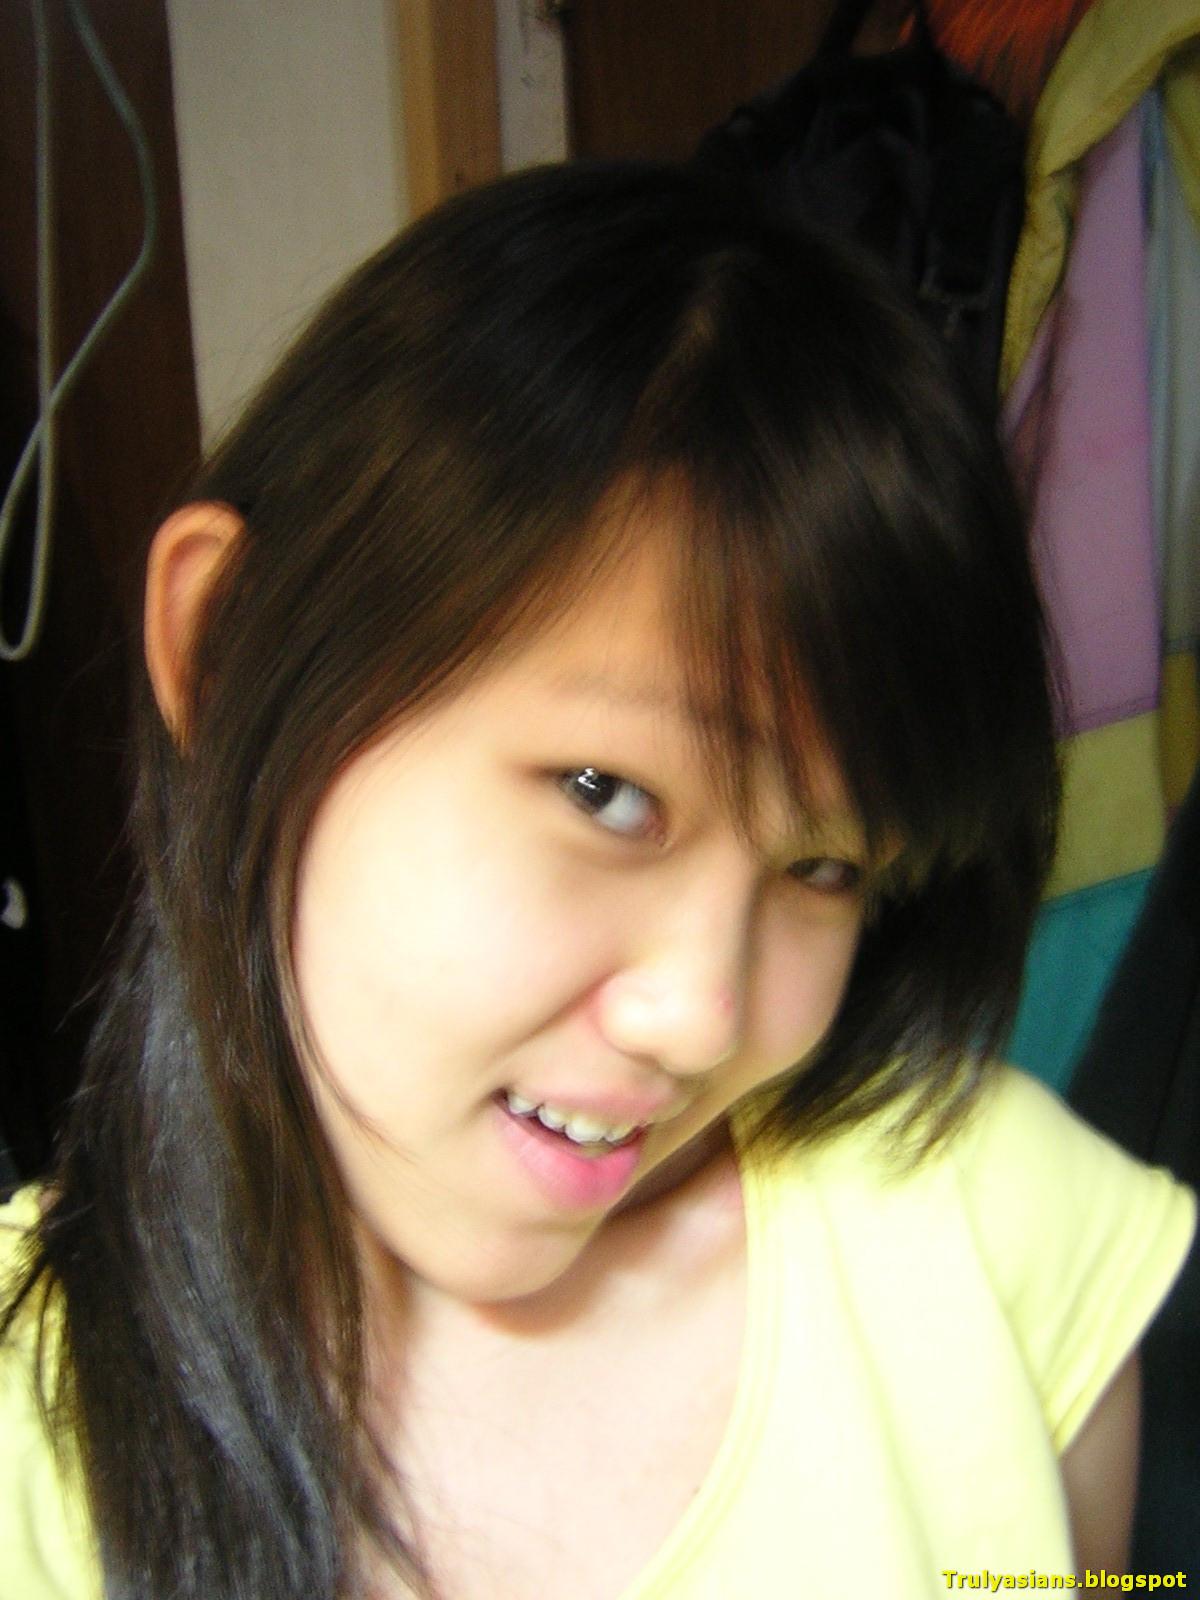 2 bp blogspot GyfkjH5FIek Ufwy7TssNoI AAAAAAAAD6g kZYOZp02bqA s1600 trulyasians blogspot Busty Indon Girl Nude 054